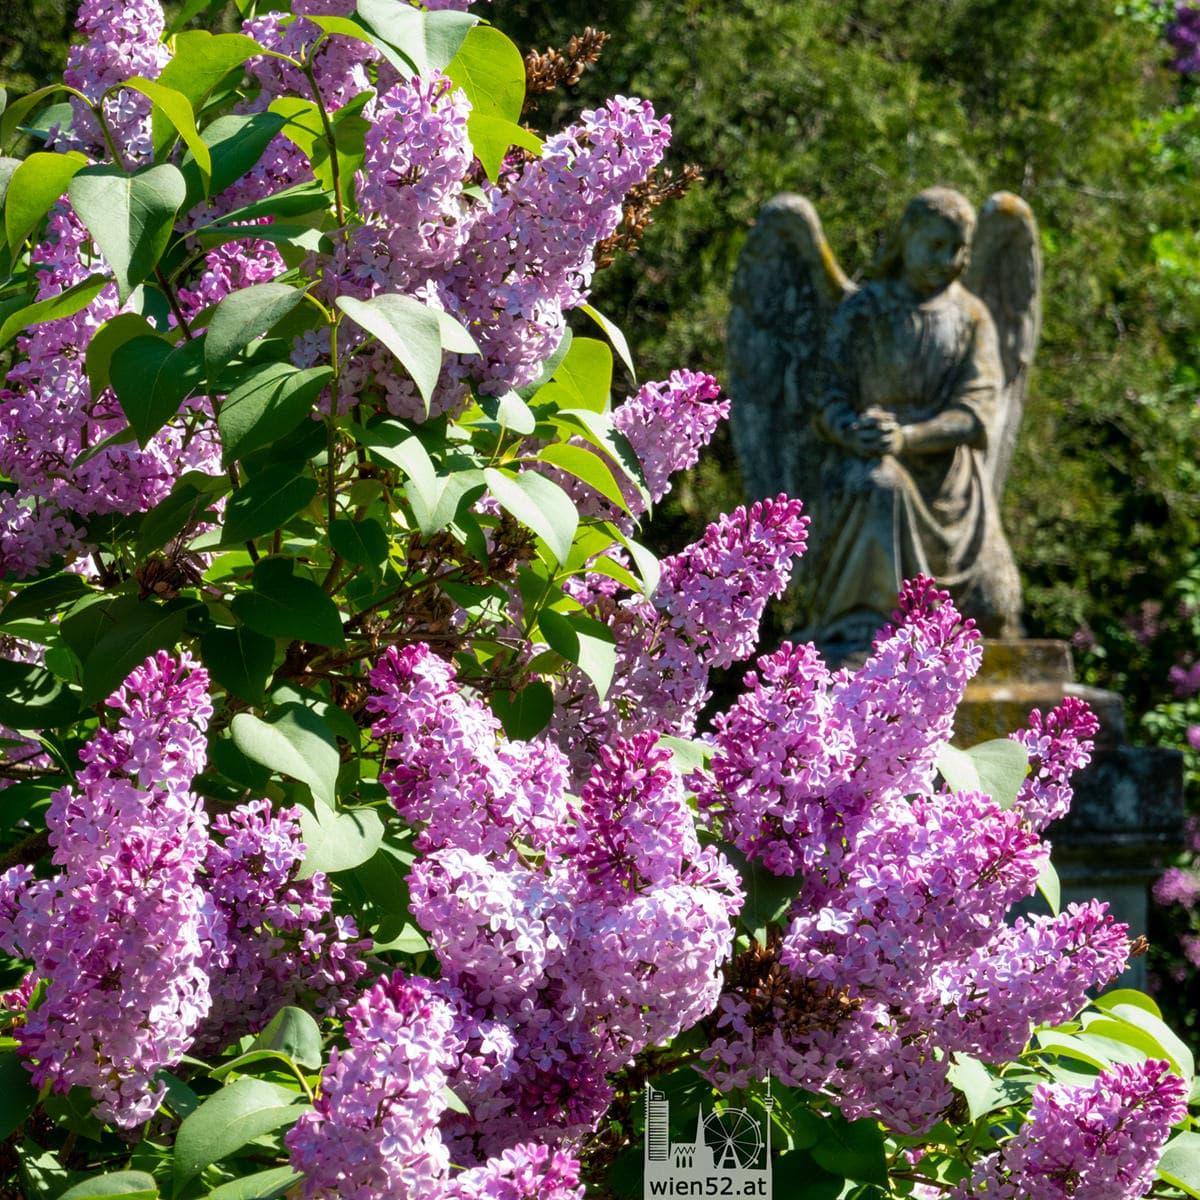 Fliederblüte am Sankt Marxer Friedhof